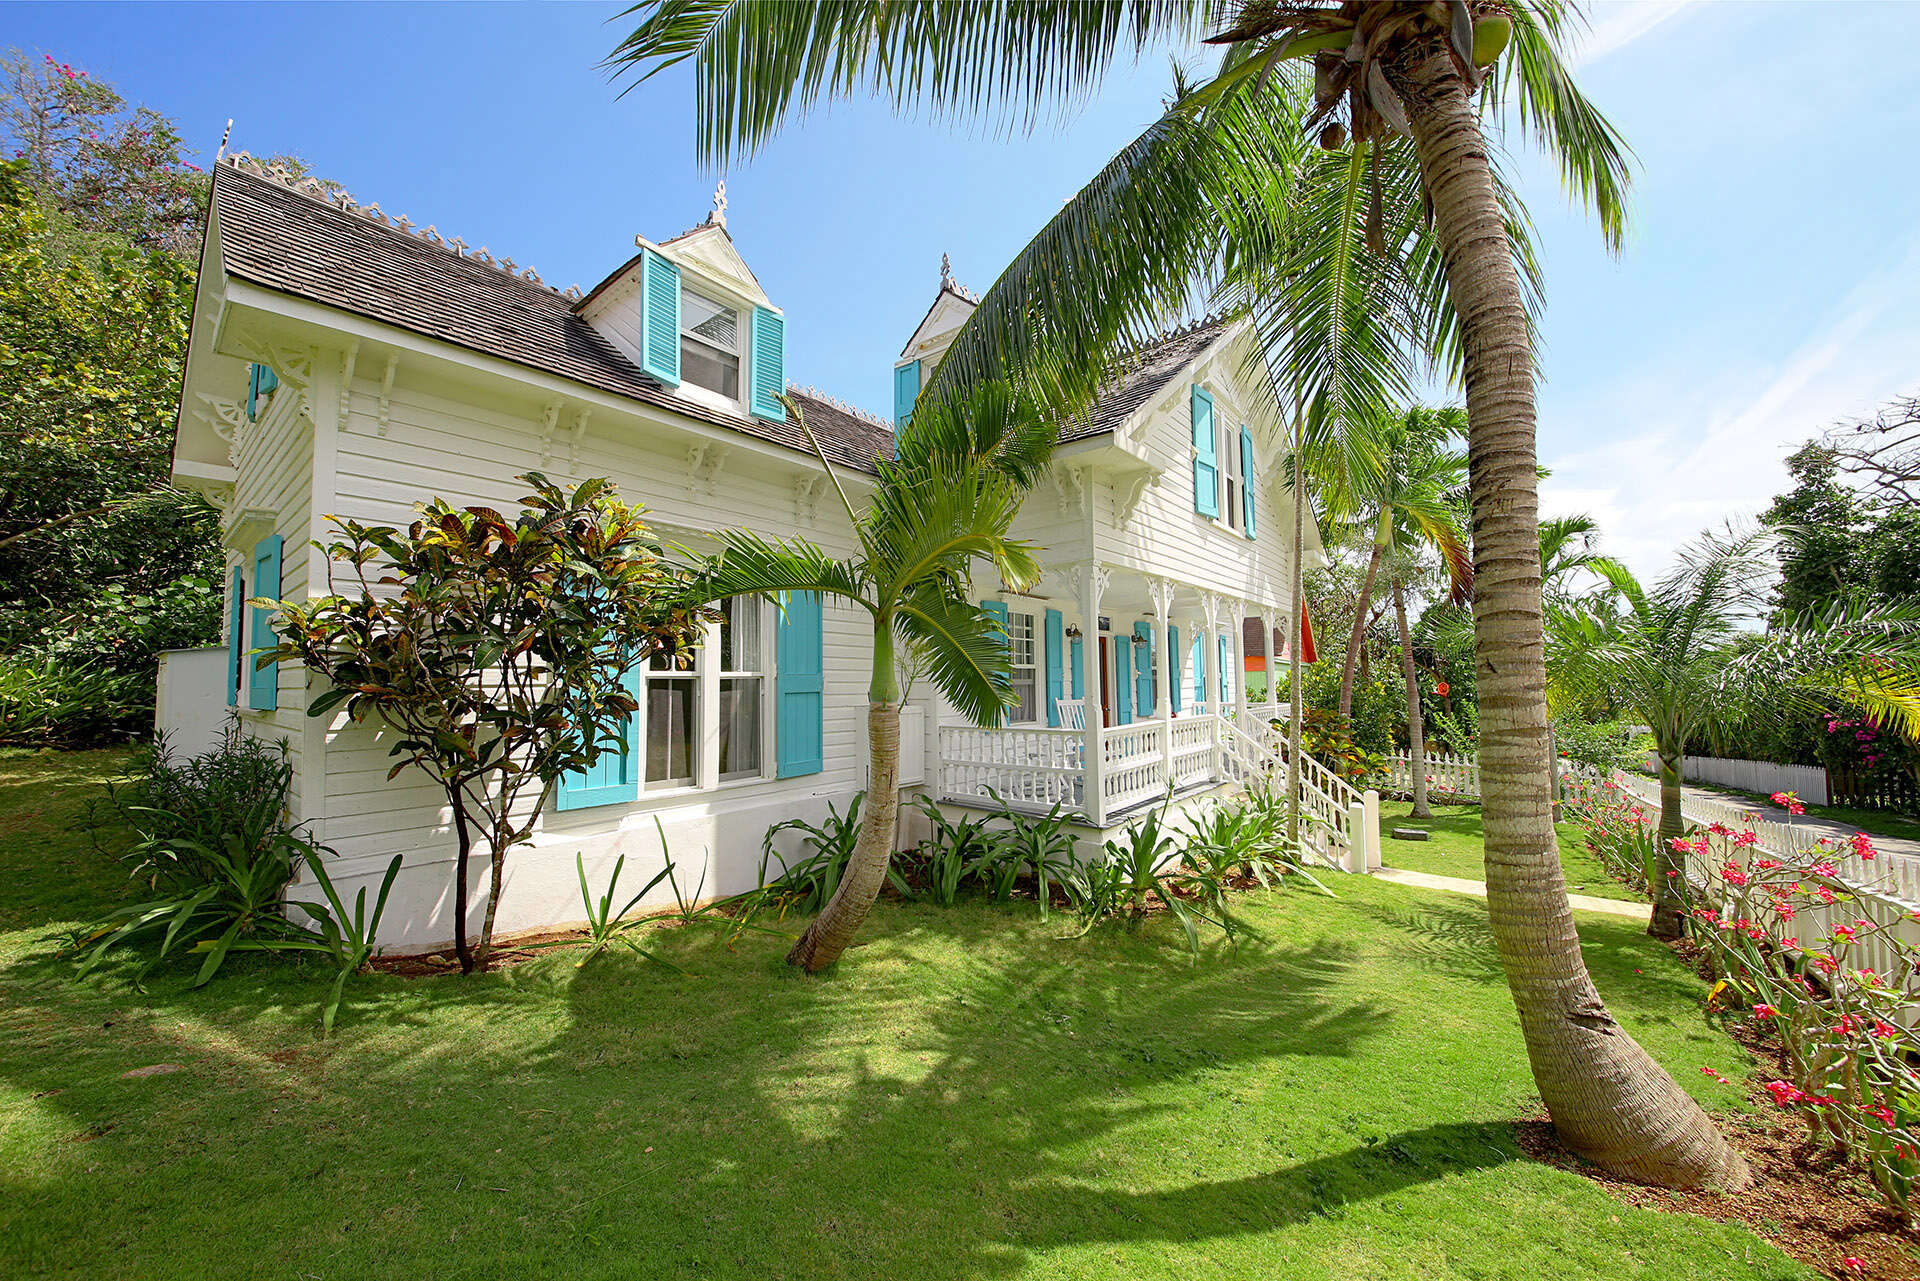 Luxury villa rentals caribbean - Bahamas - Eleuthera - Governors harbour - Pyfrom House - Image 1/19